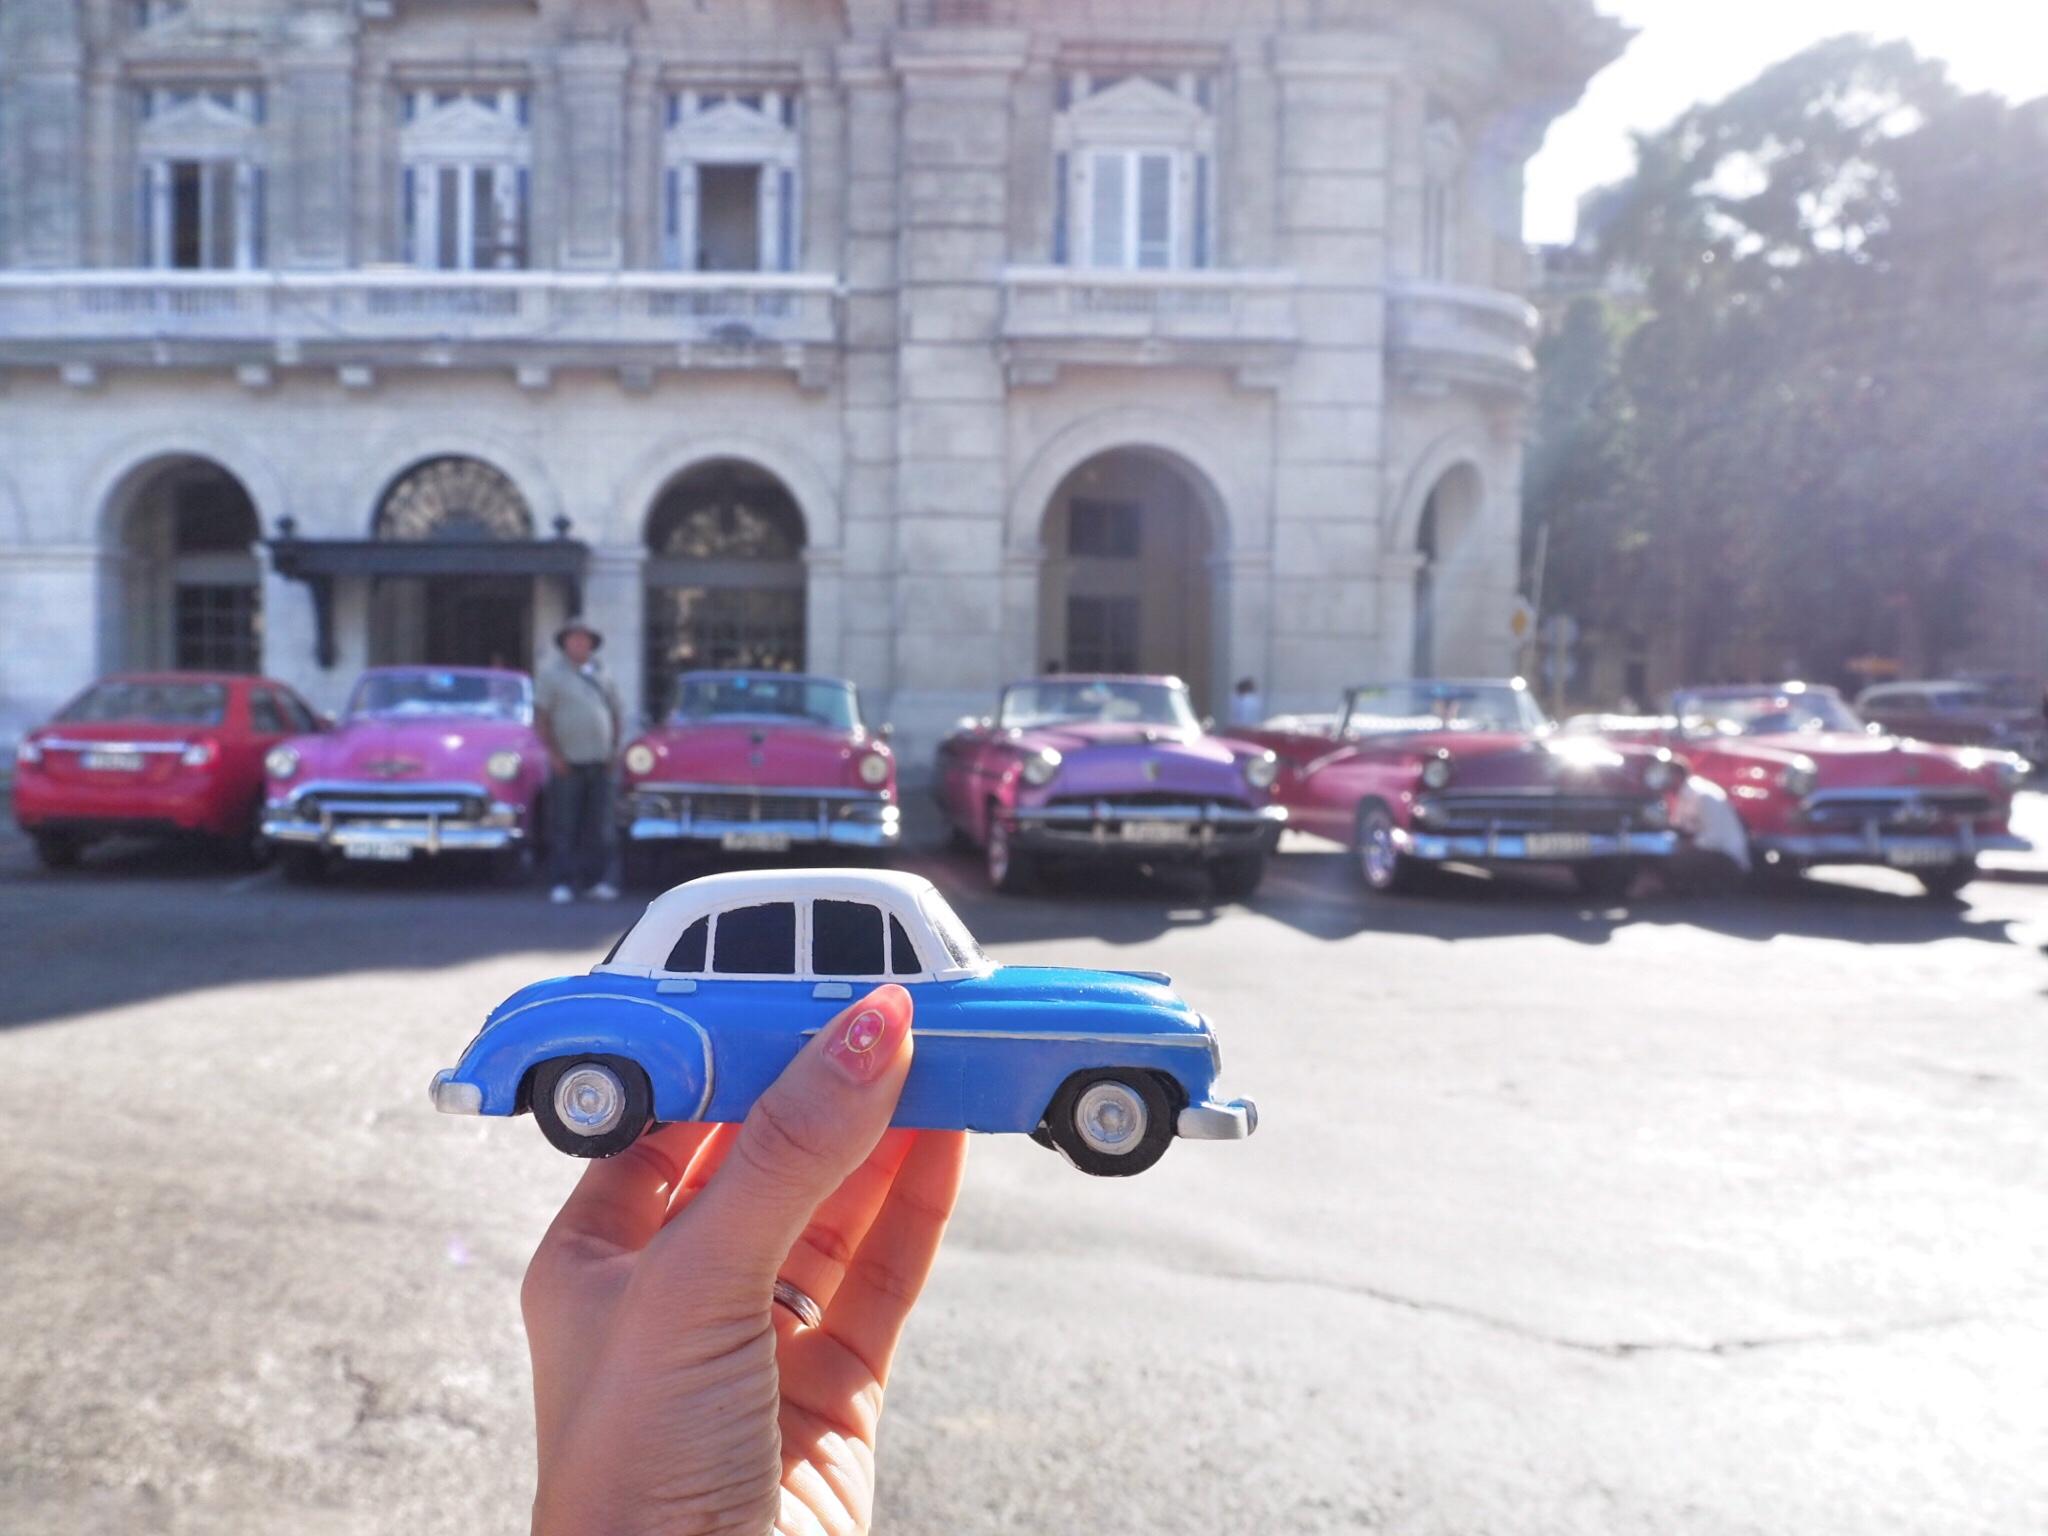 img 6733 - Old Habana - 街全体が世界遺産 色が溢れるハバナ旧市街散歩で出会った風景